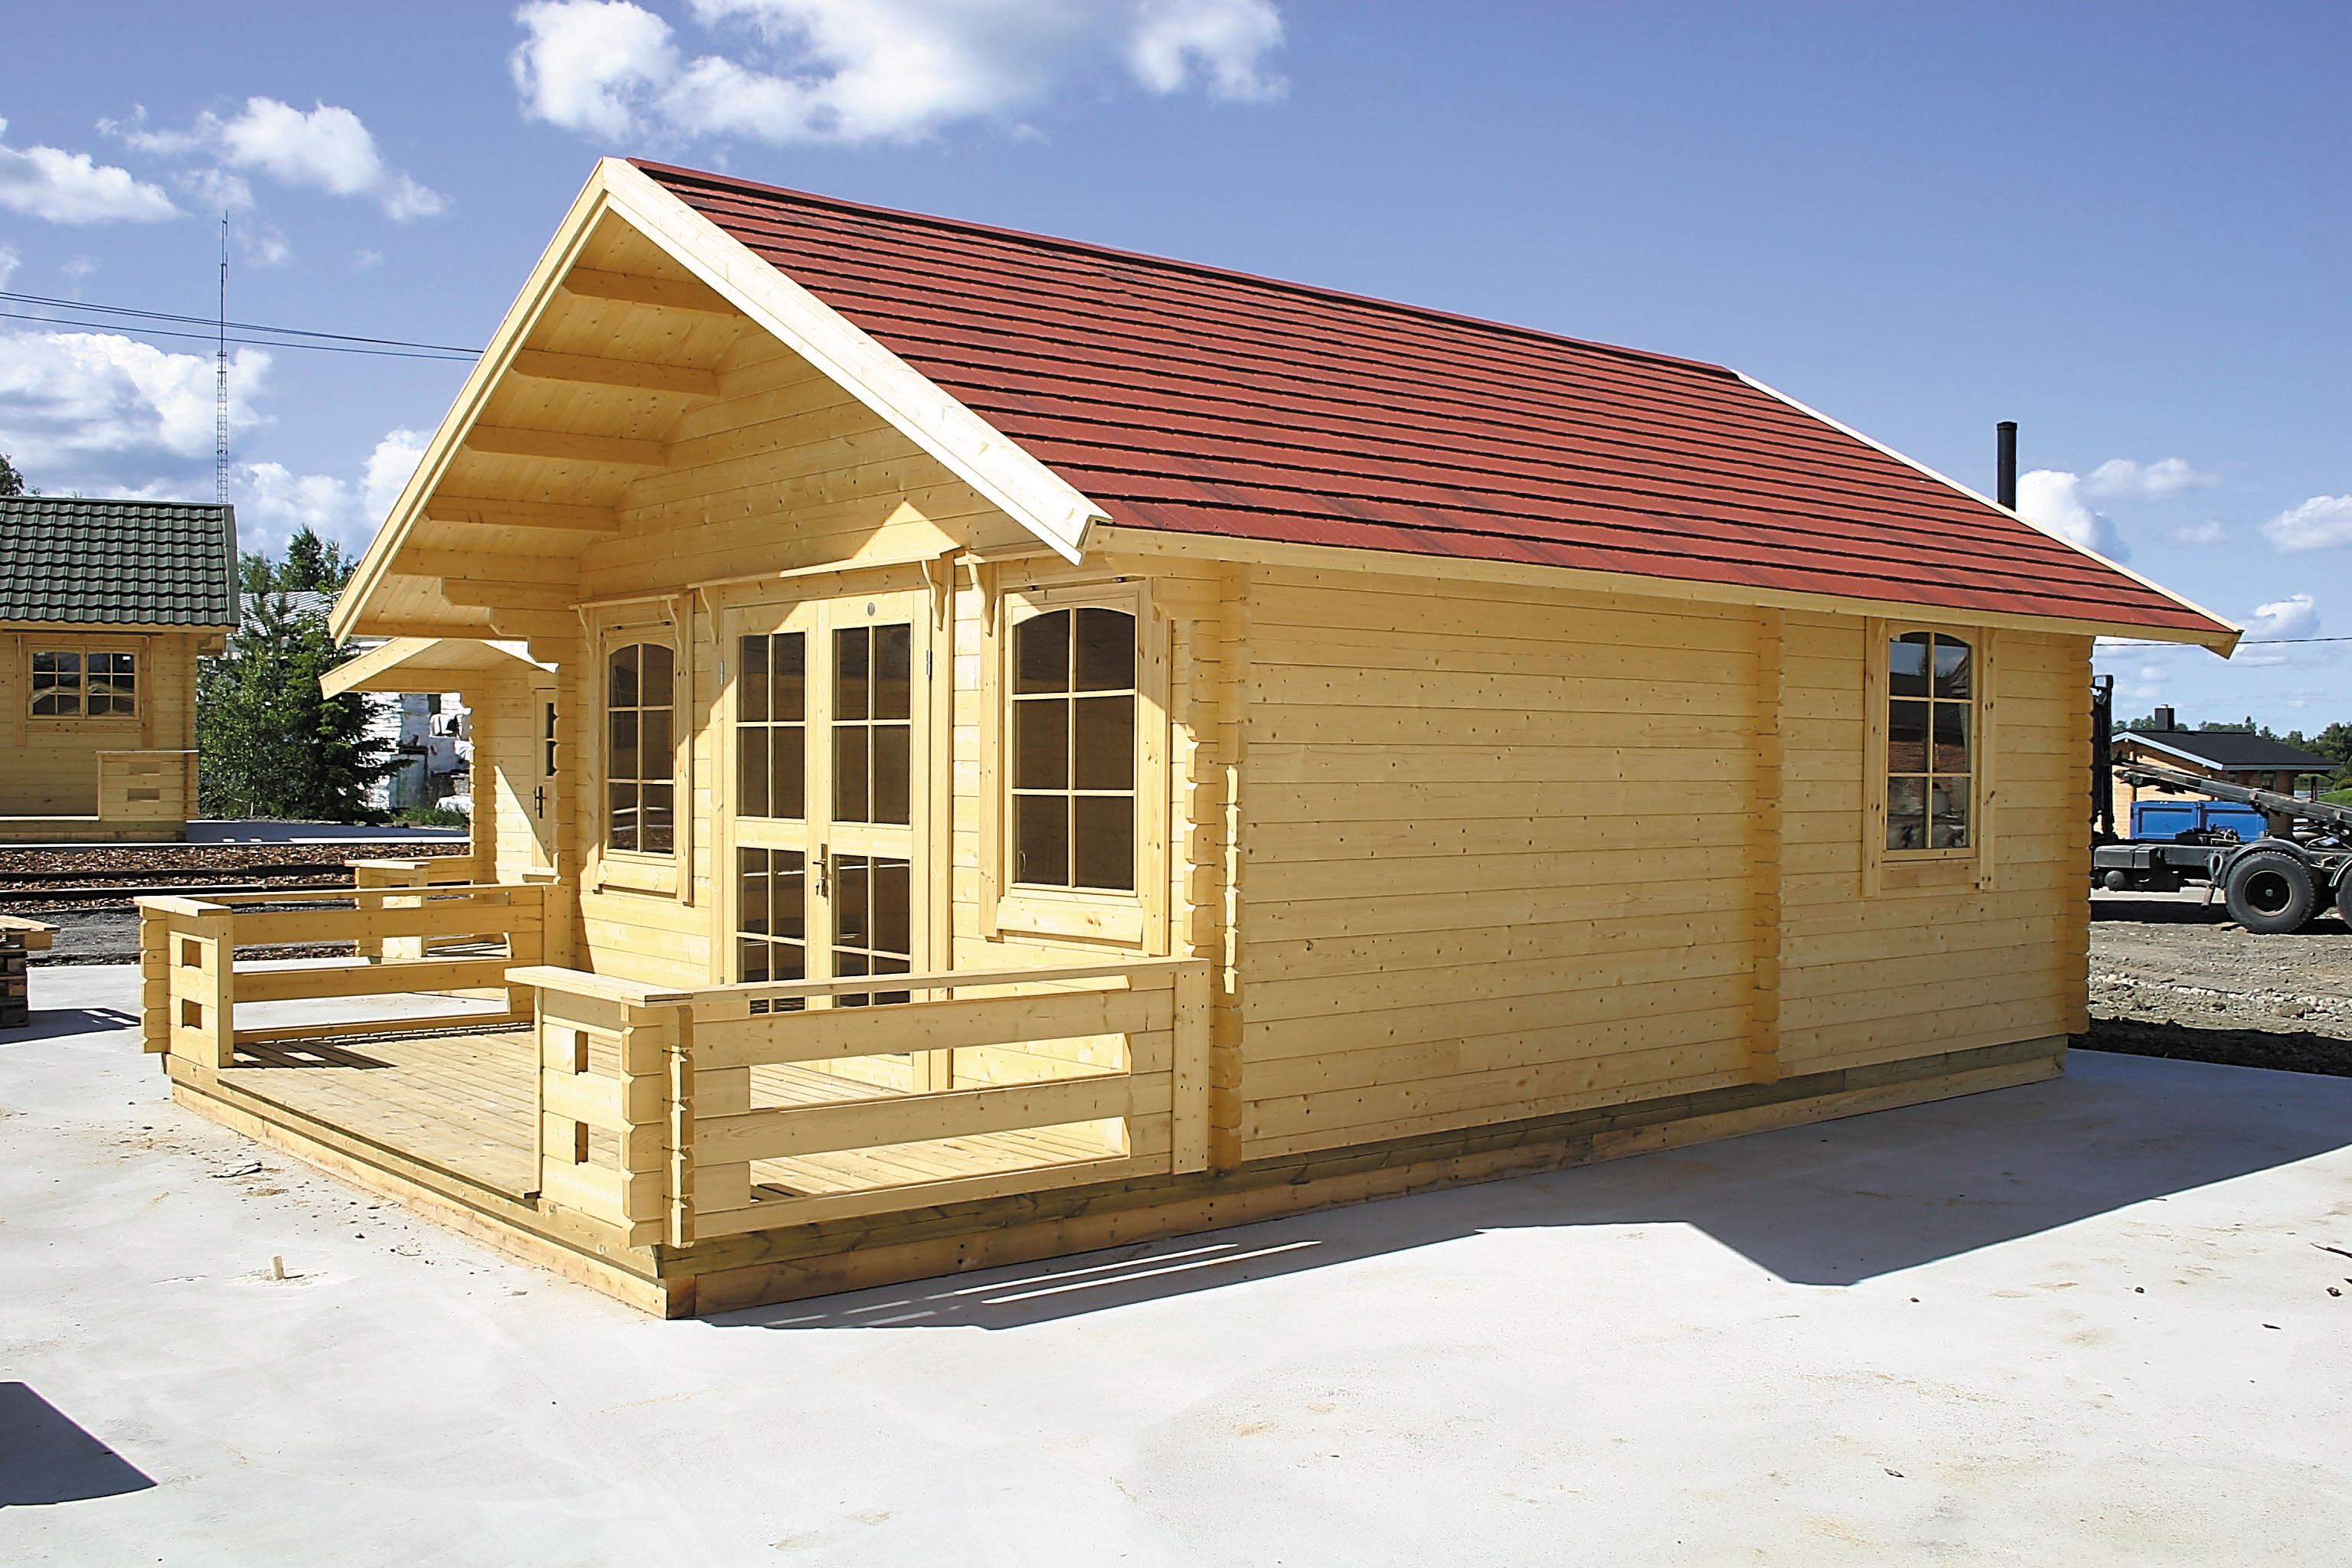 Abri de jardin en bois de 28m2 avec grande terrasse